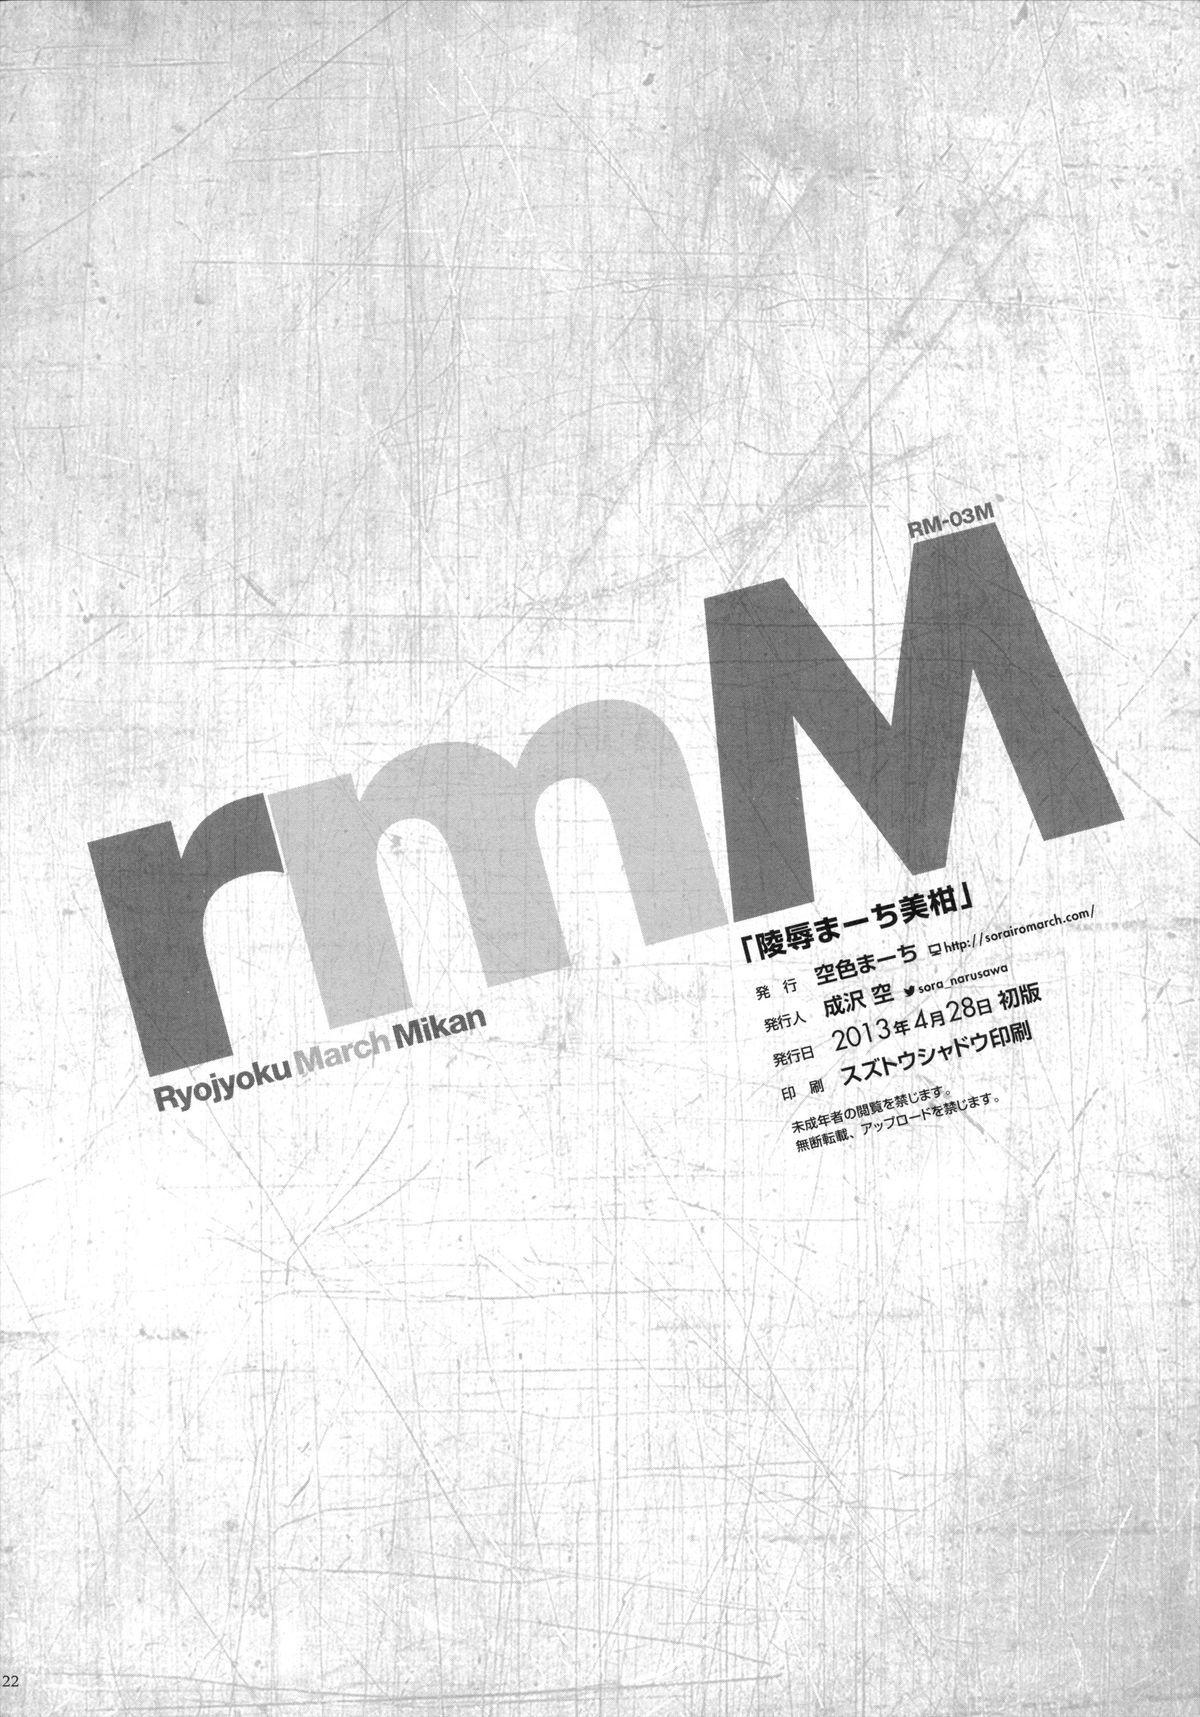 Ryoujoku March Mikan 19